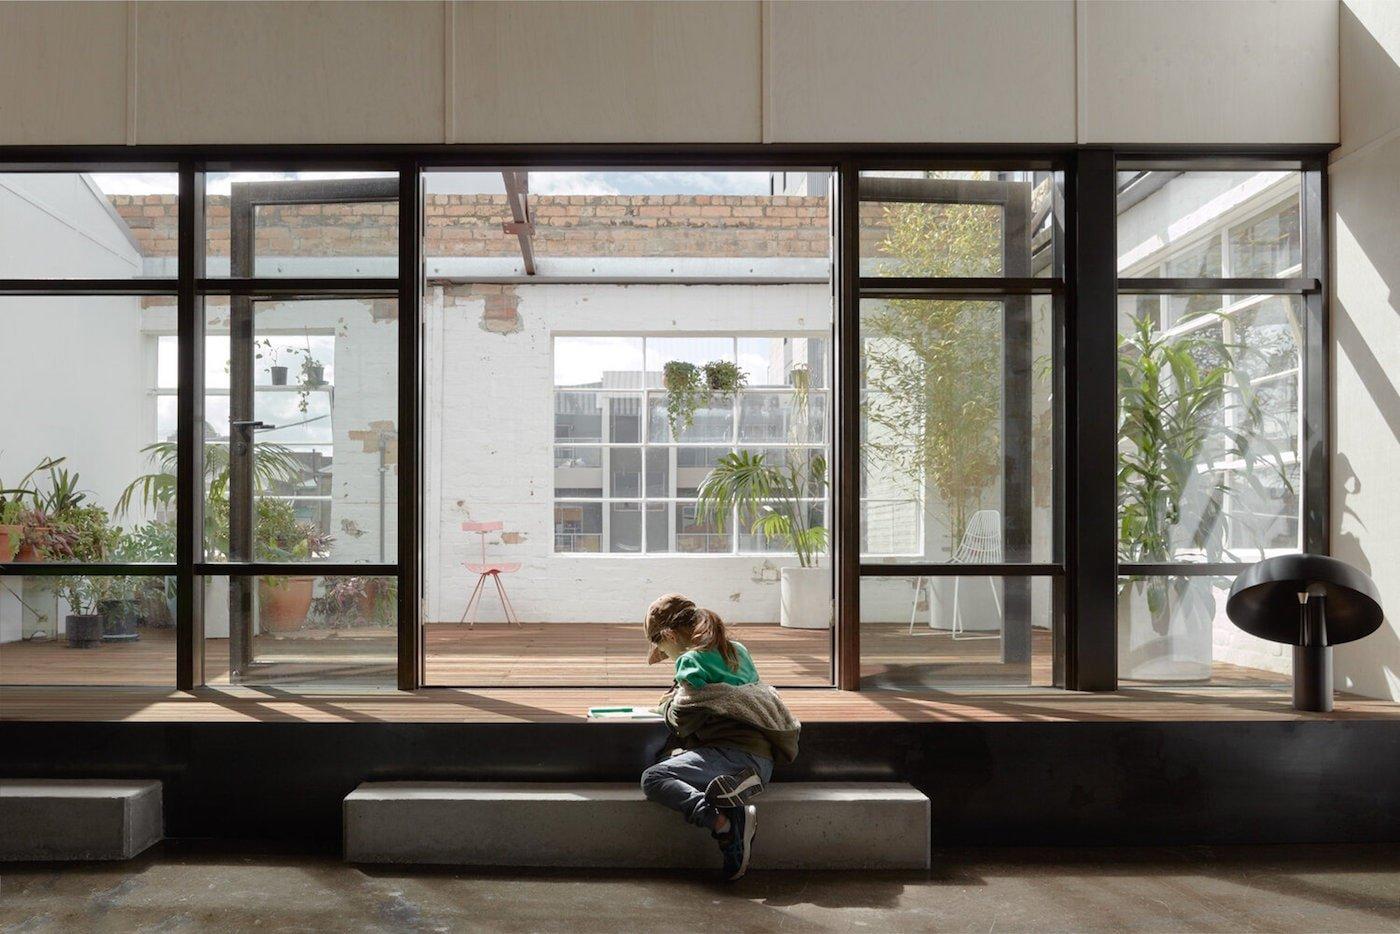 Eco Edition_Breathe Architecture_Warehouse Greenhouse_Architecture sustainability 7-min